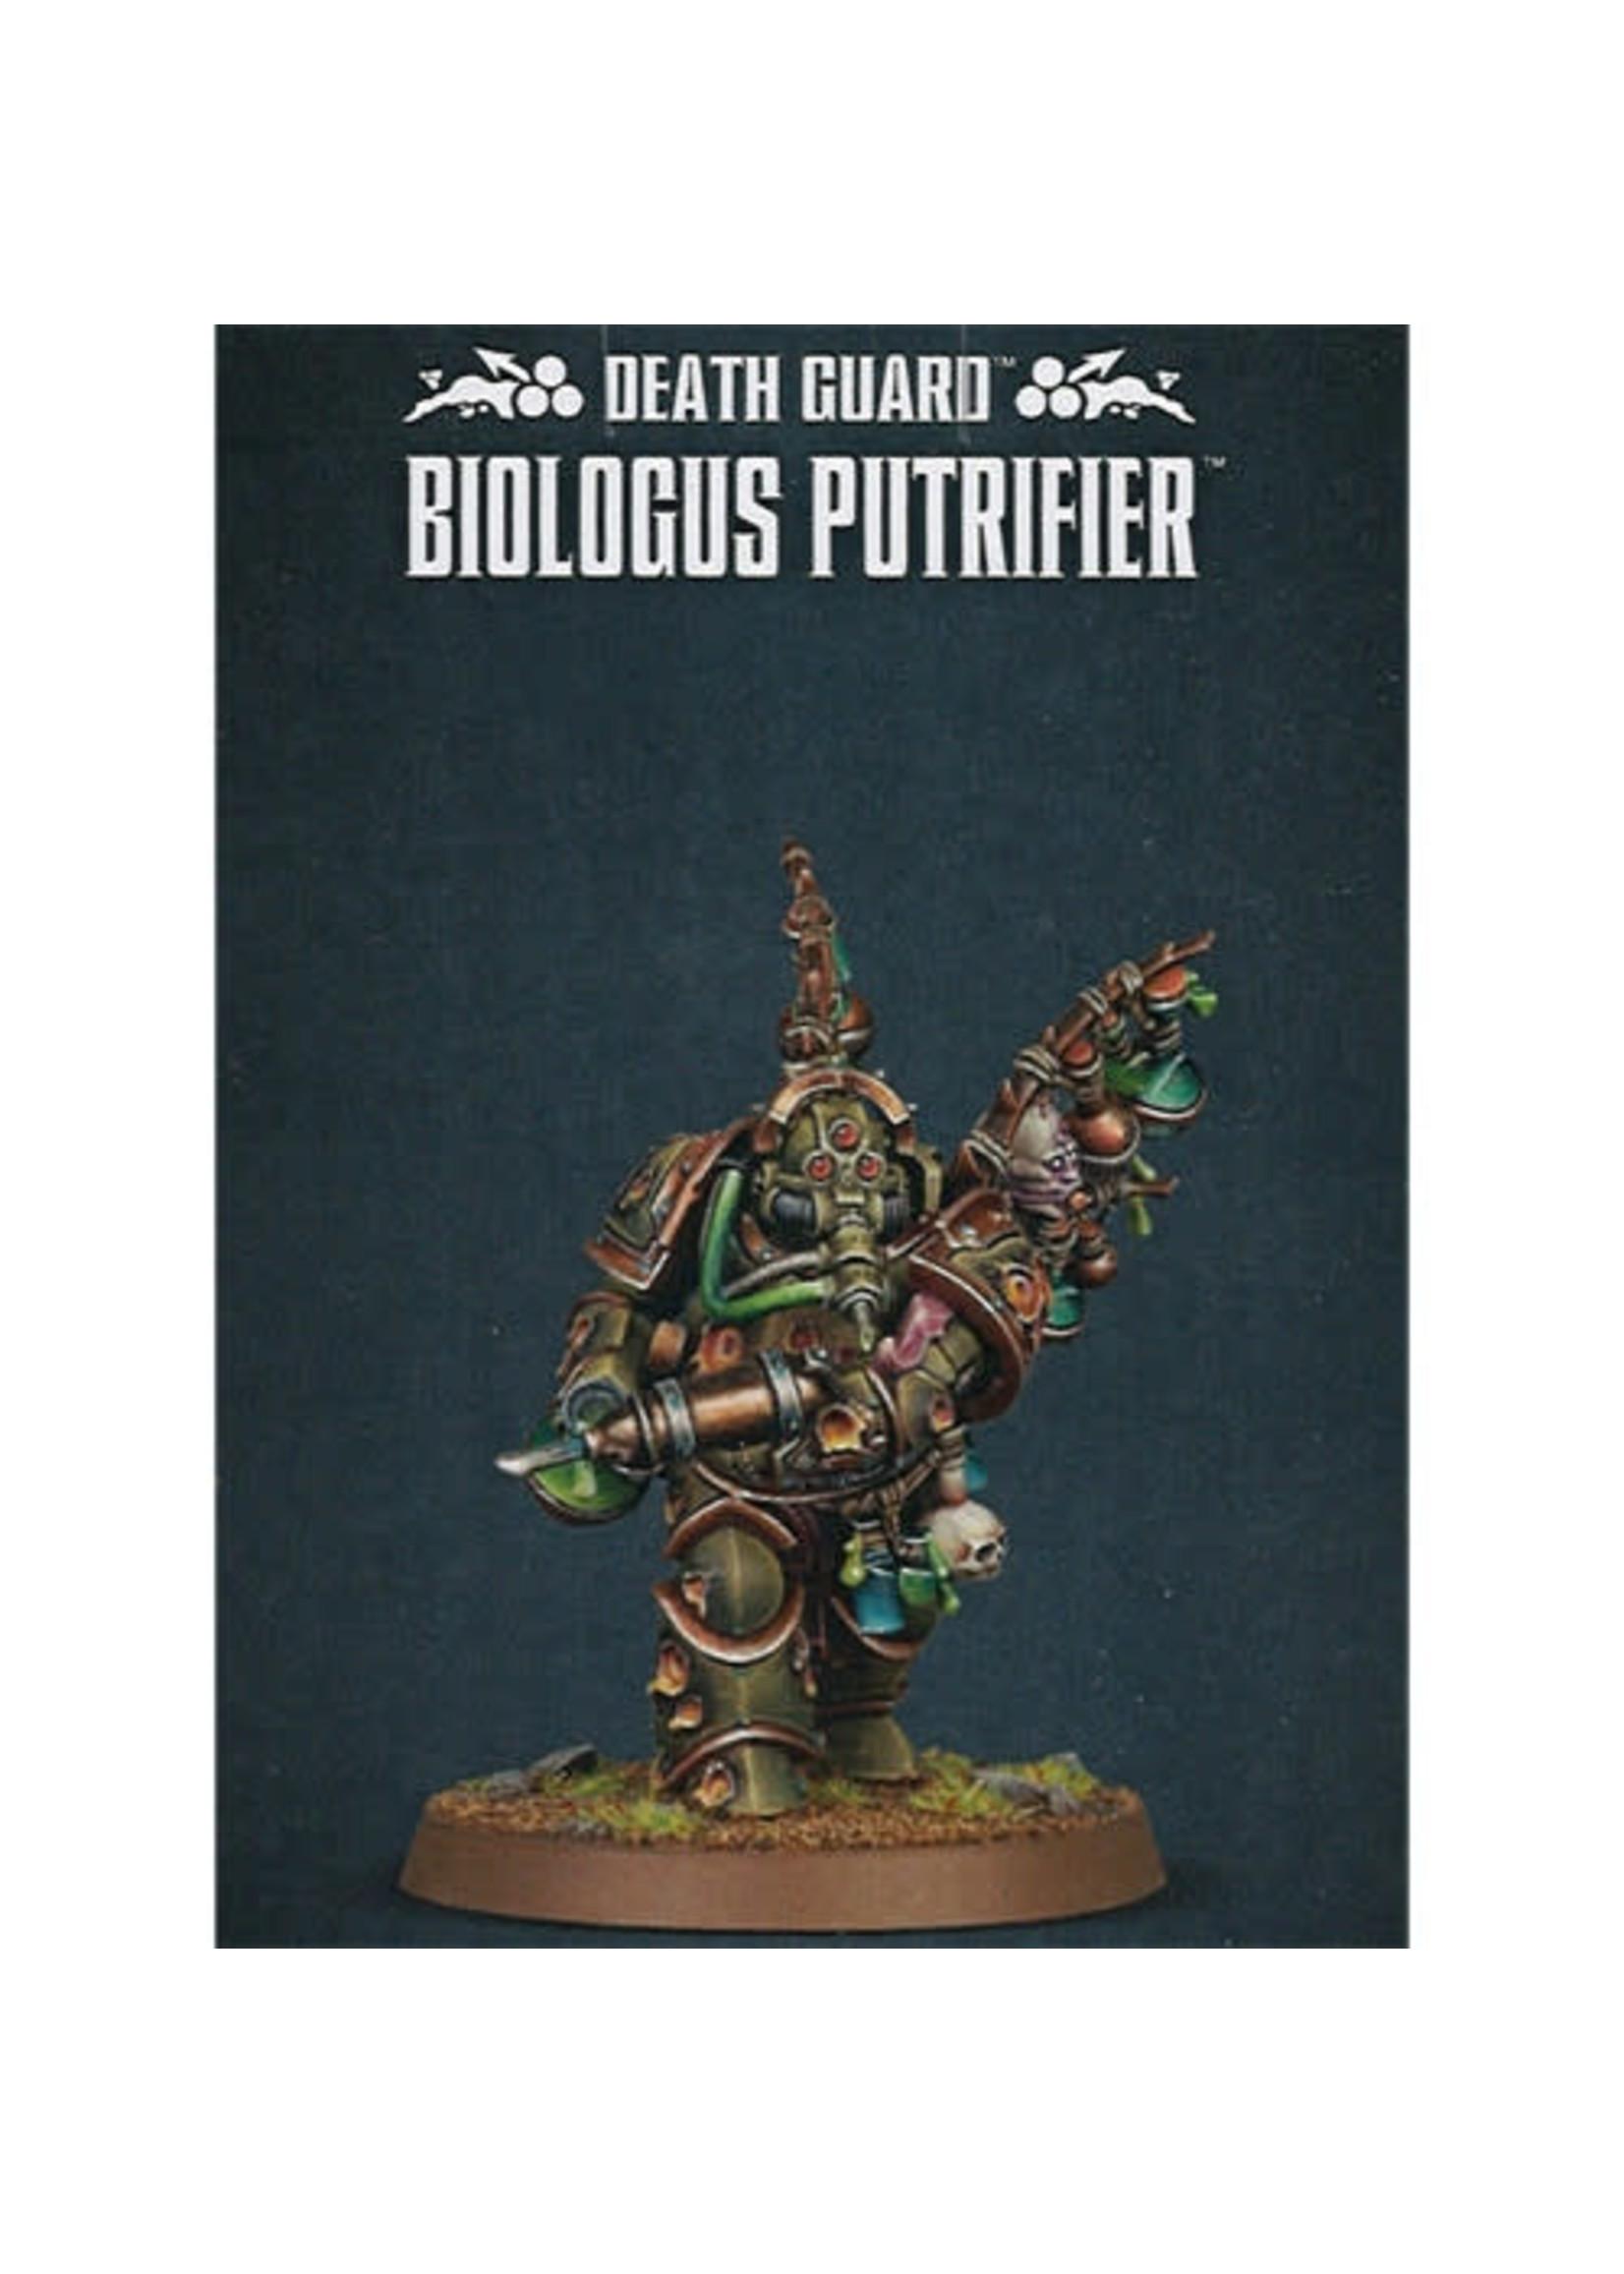 Death Guard Biologus Putrifier (40K)